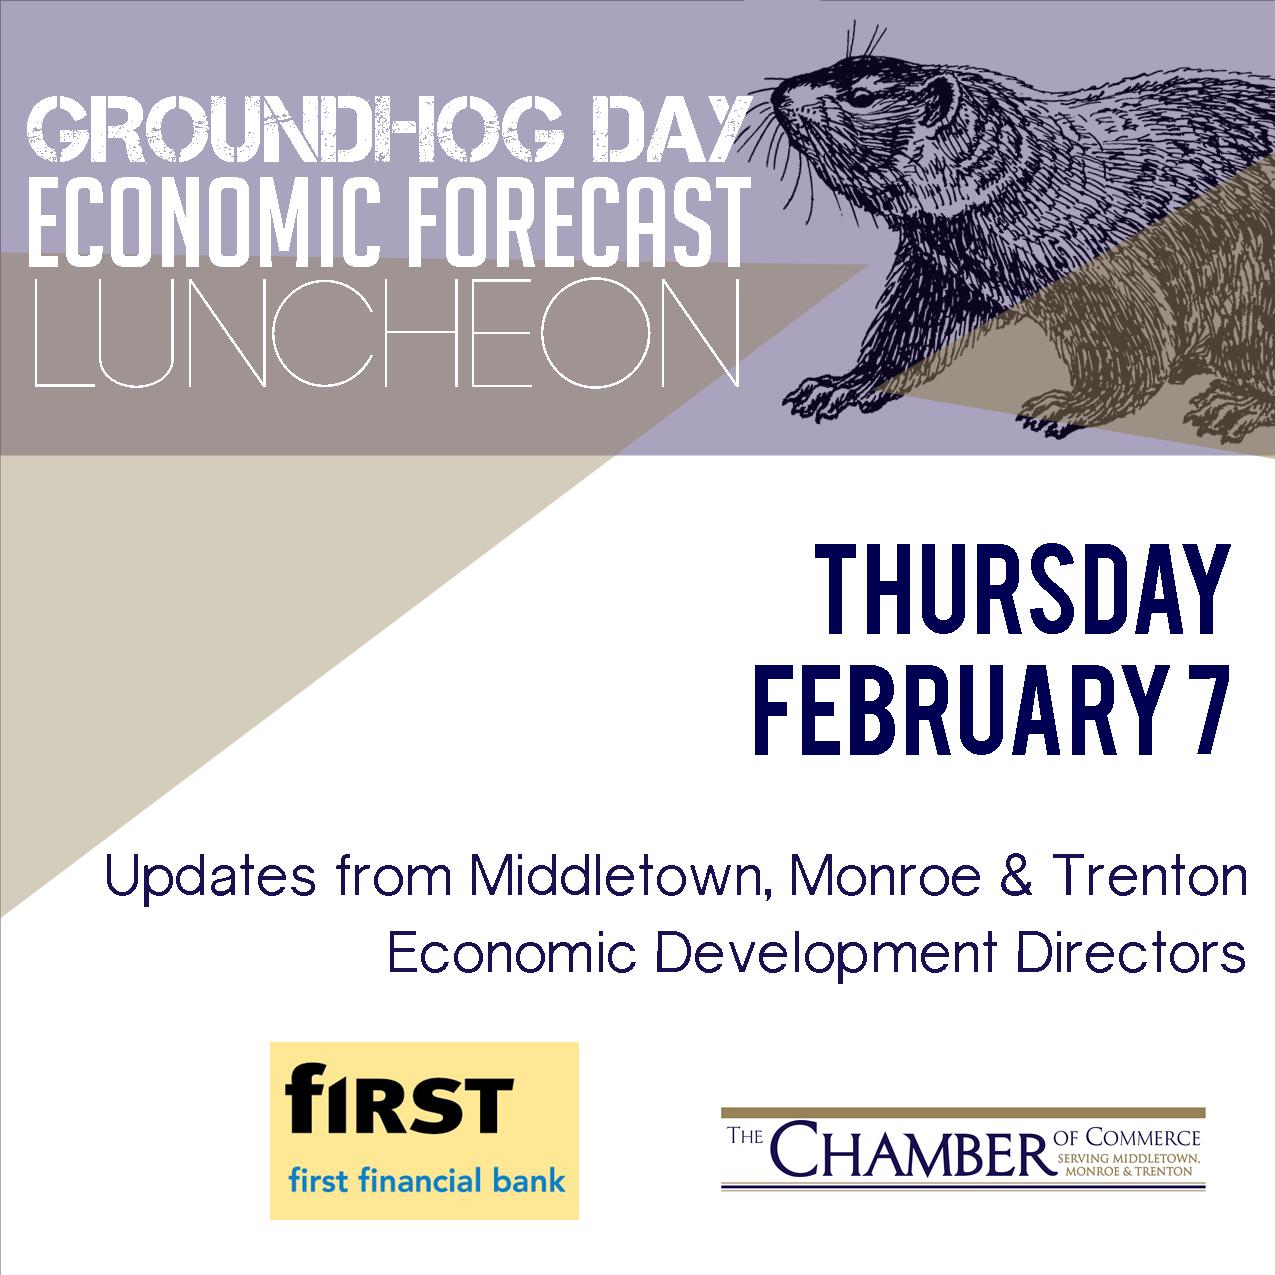 Groundhog Economic Forecast Luncheon